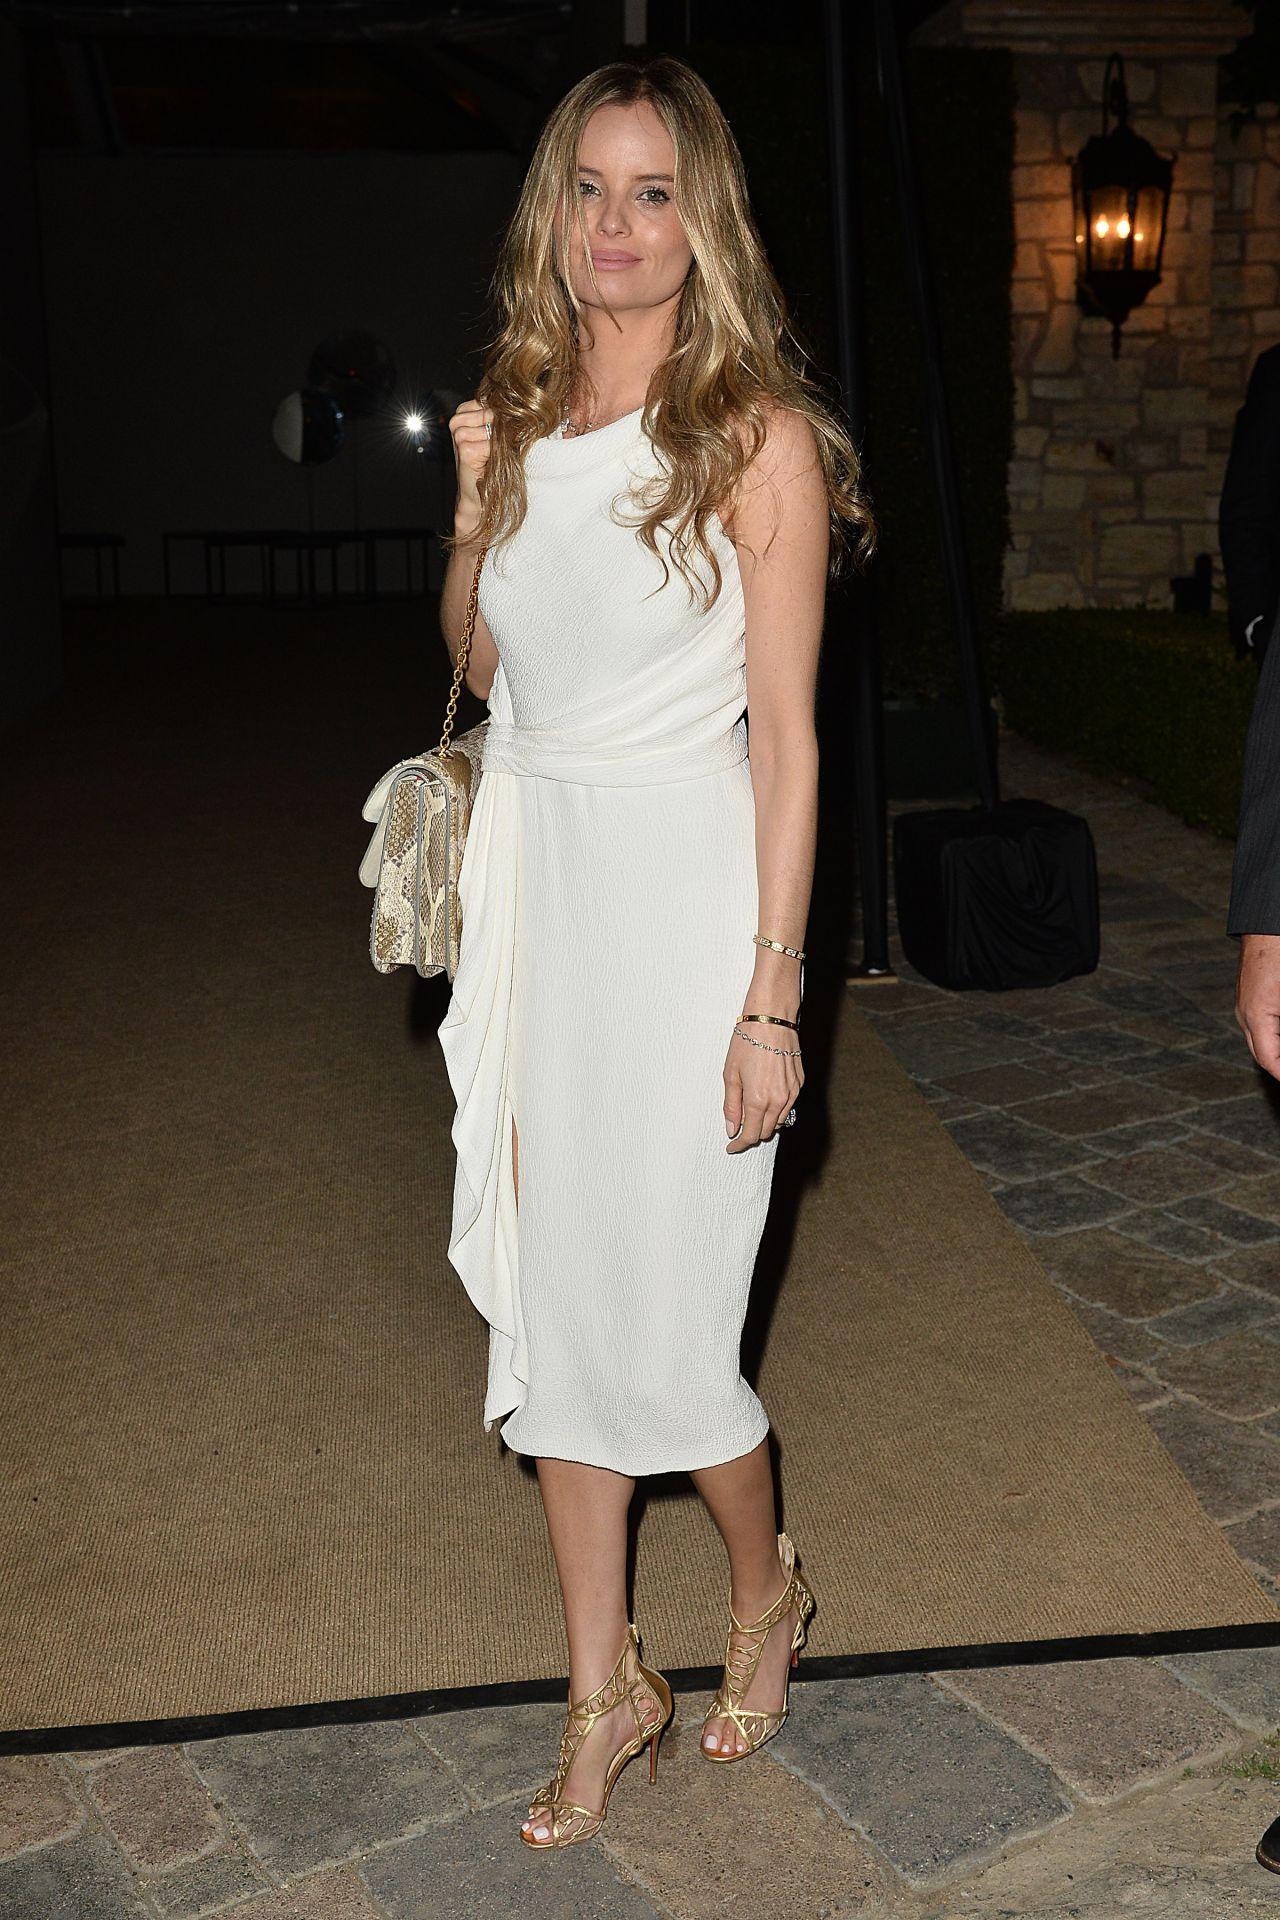 Simone Holtznagel - Leaves a Pre Oscar Talent Agency Party ...